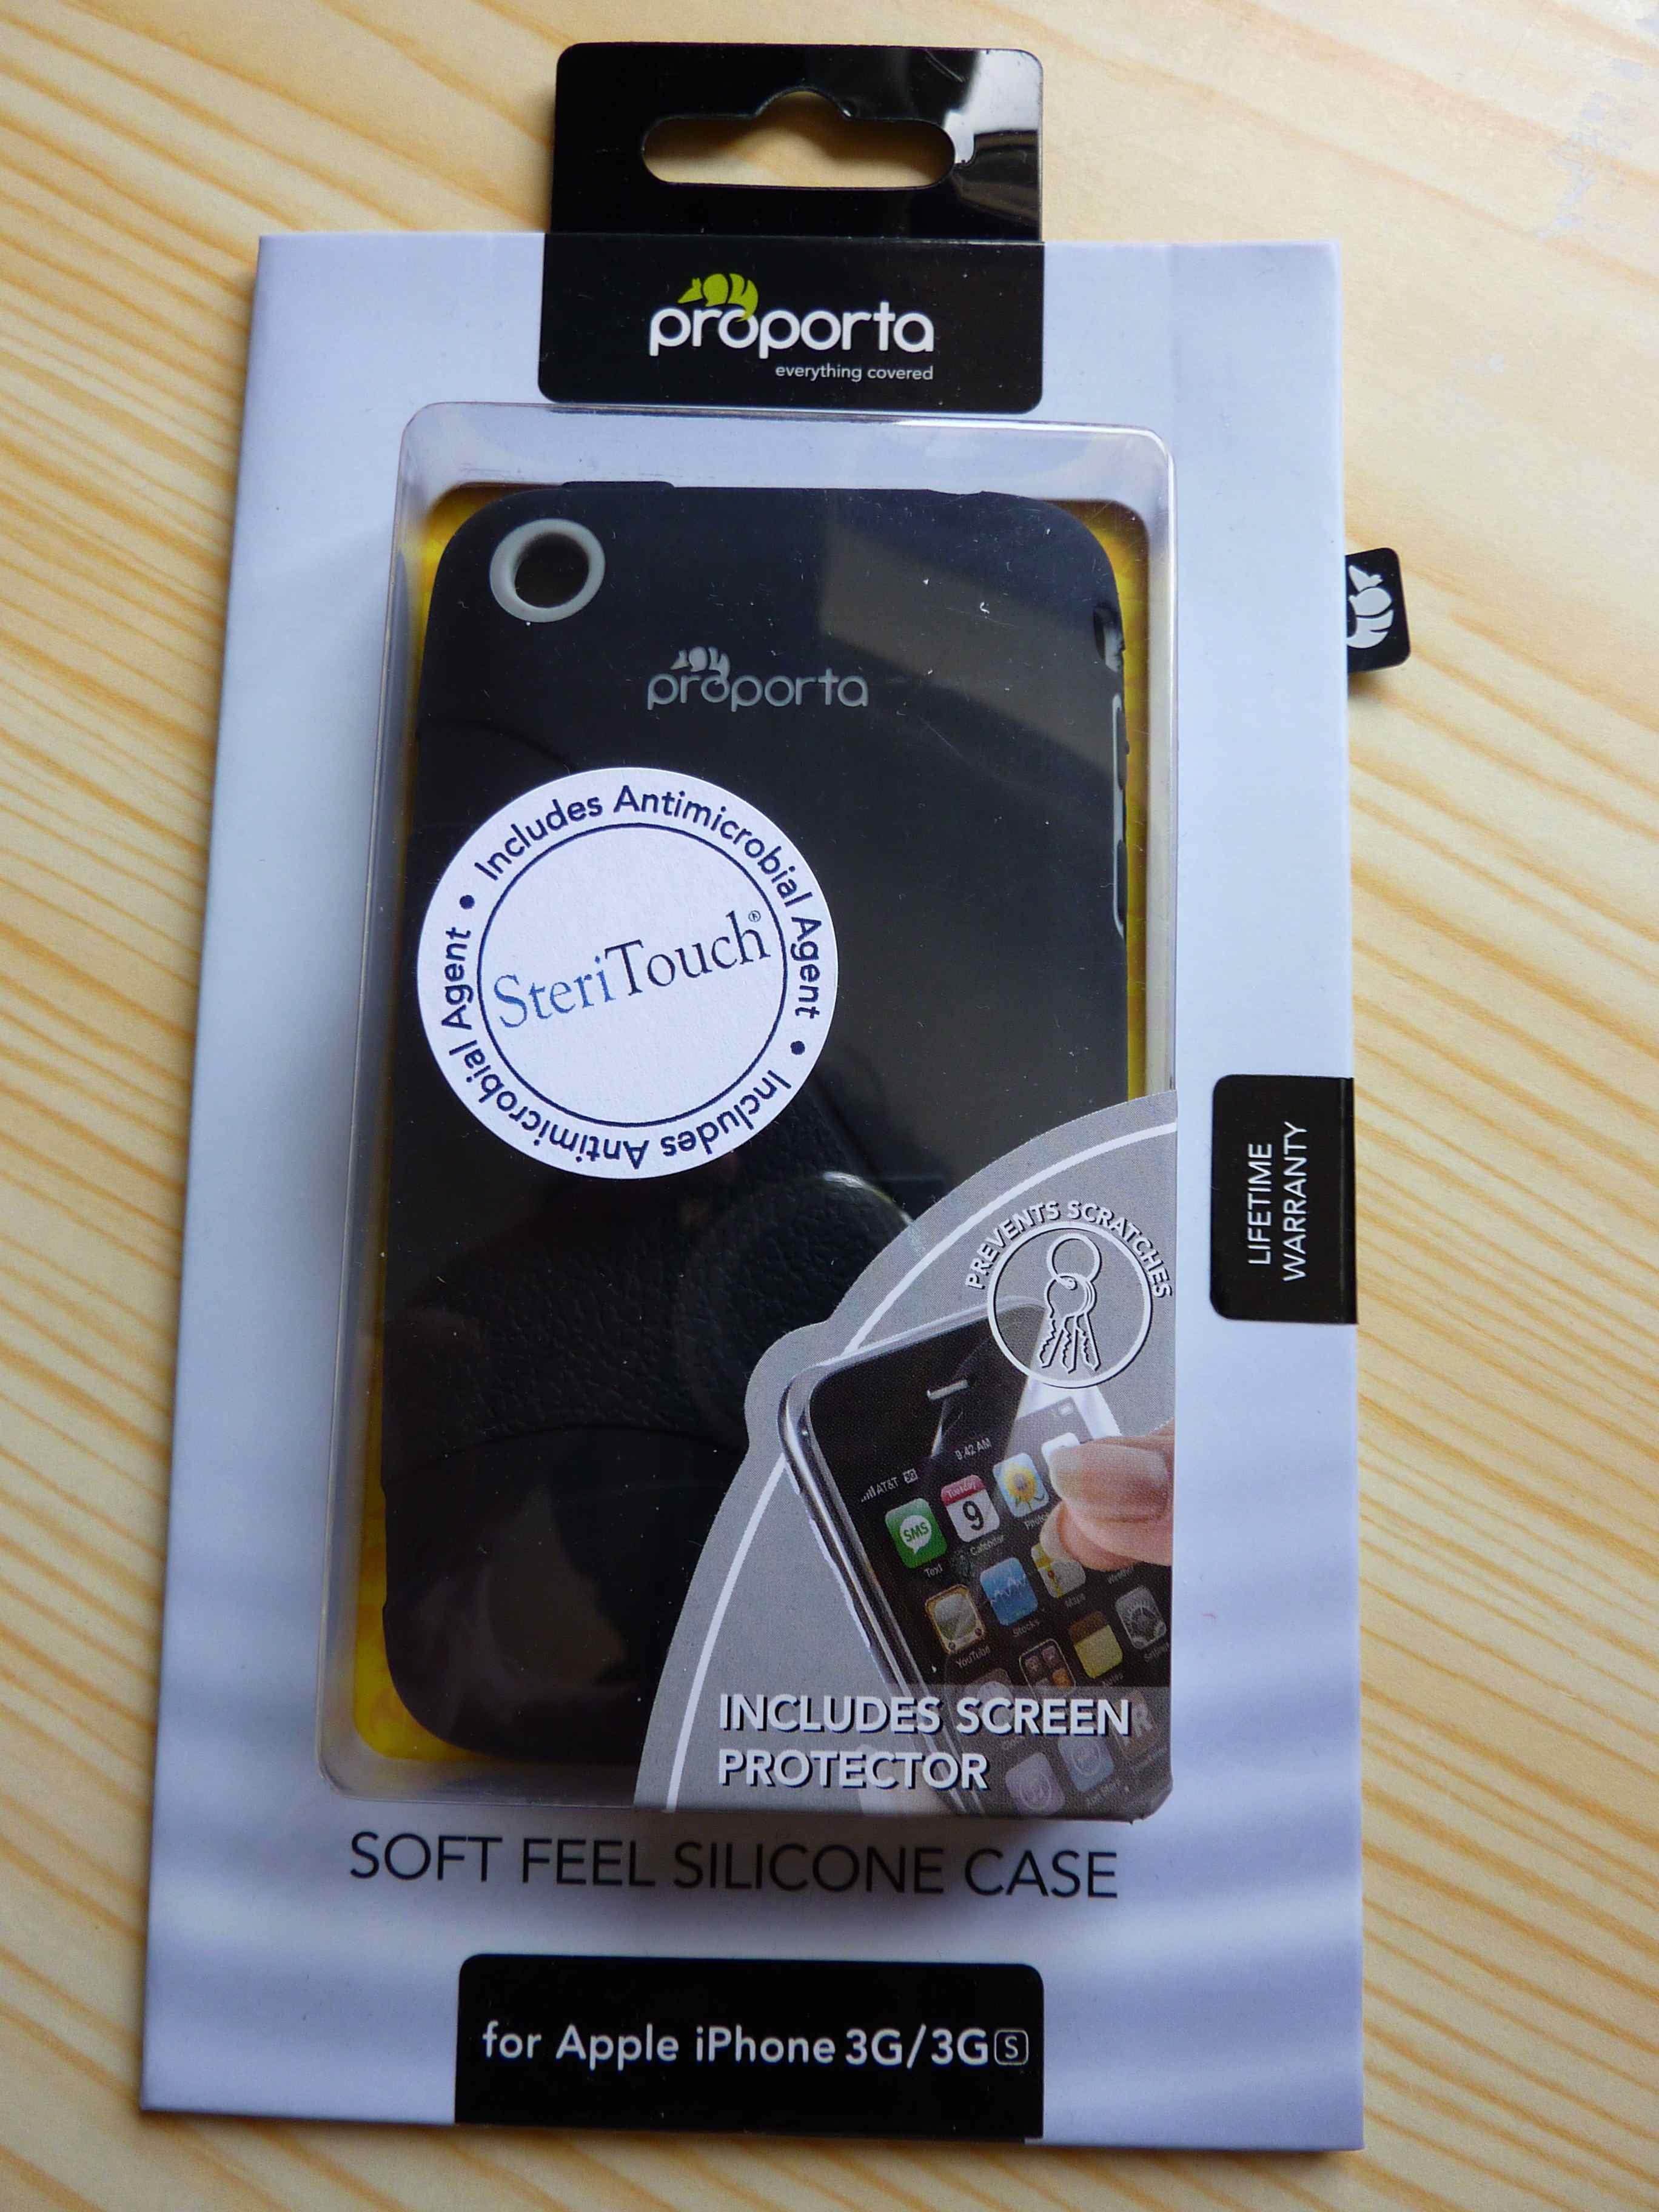 Proporta-silicon-case-01